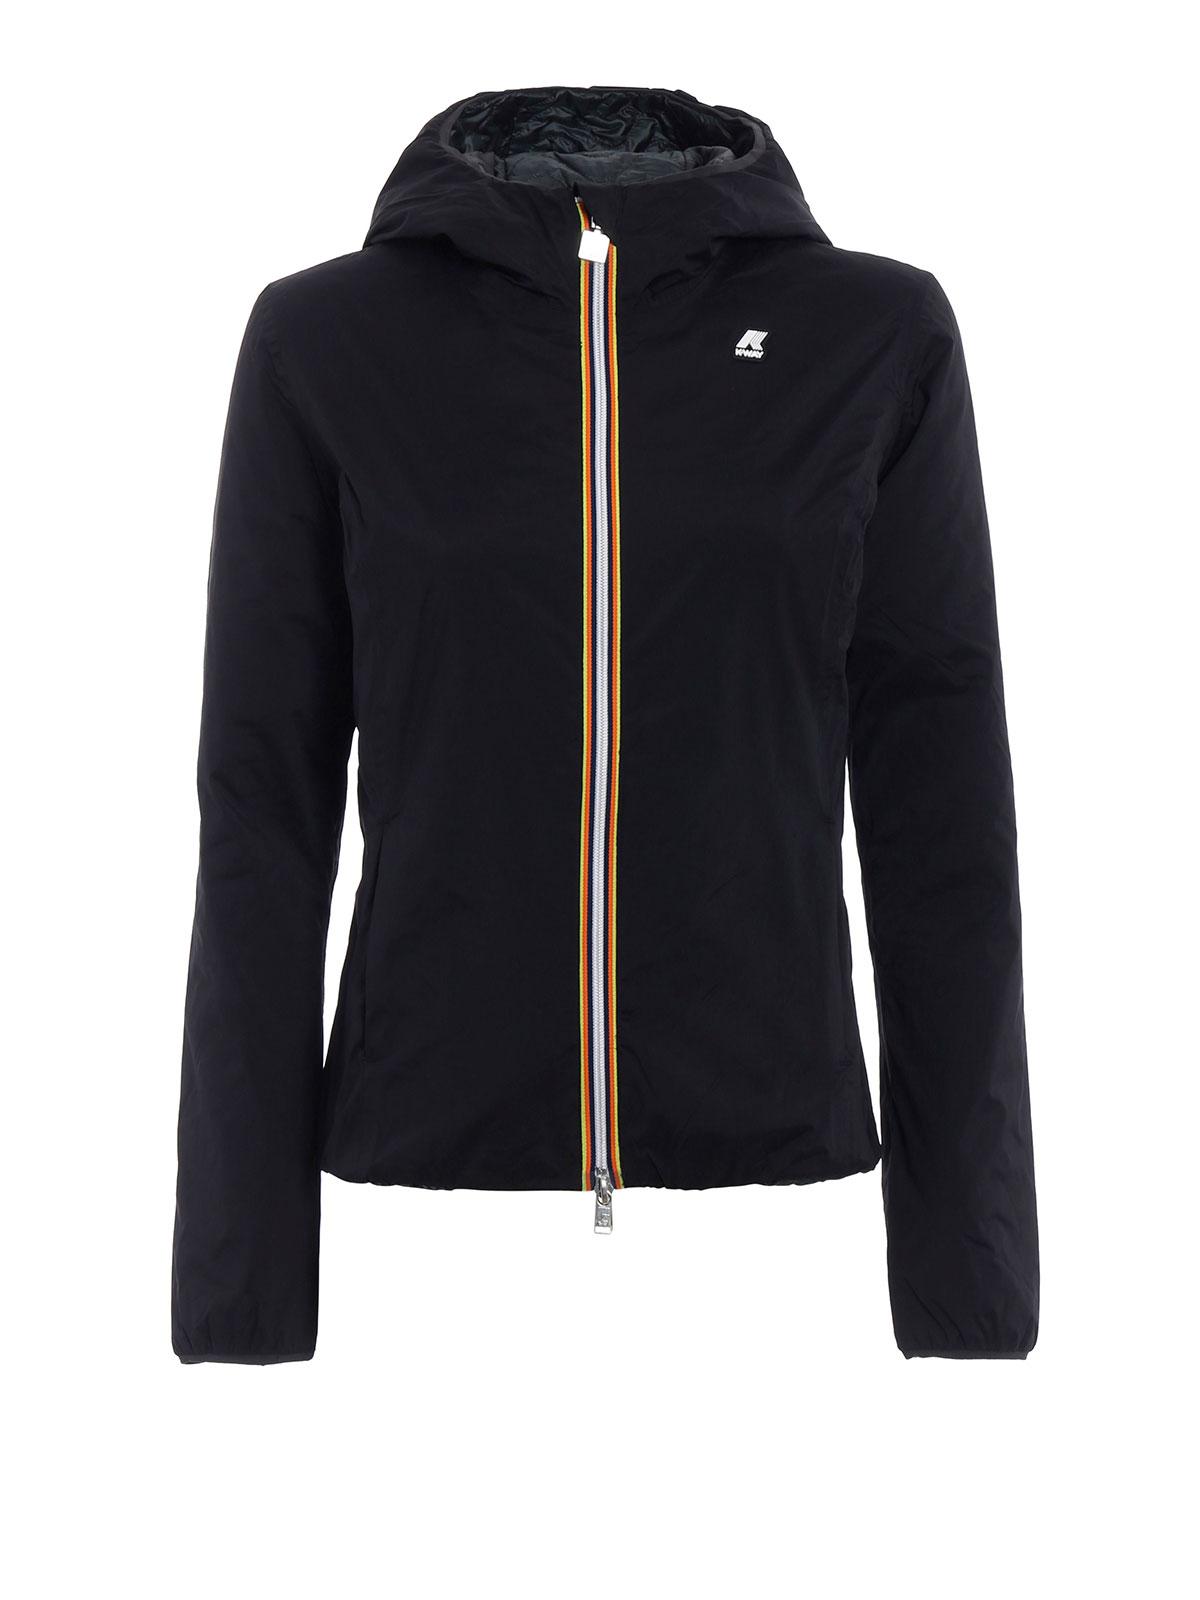 48279bfcef78 Women s jackets Spring Summer 2019